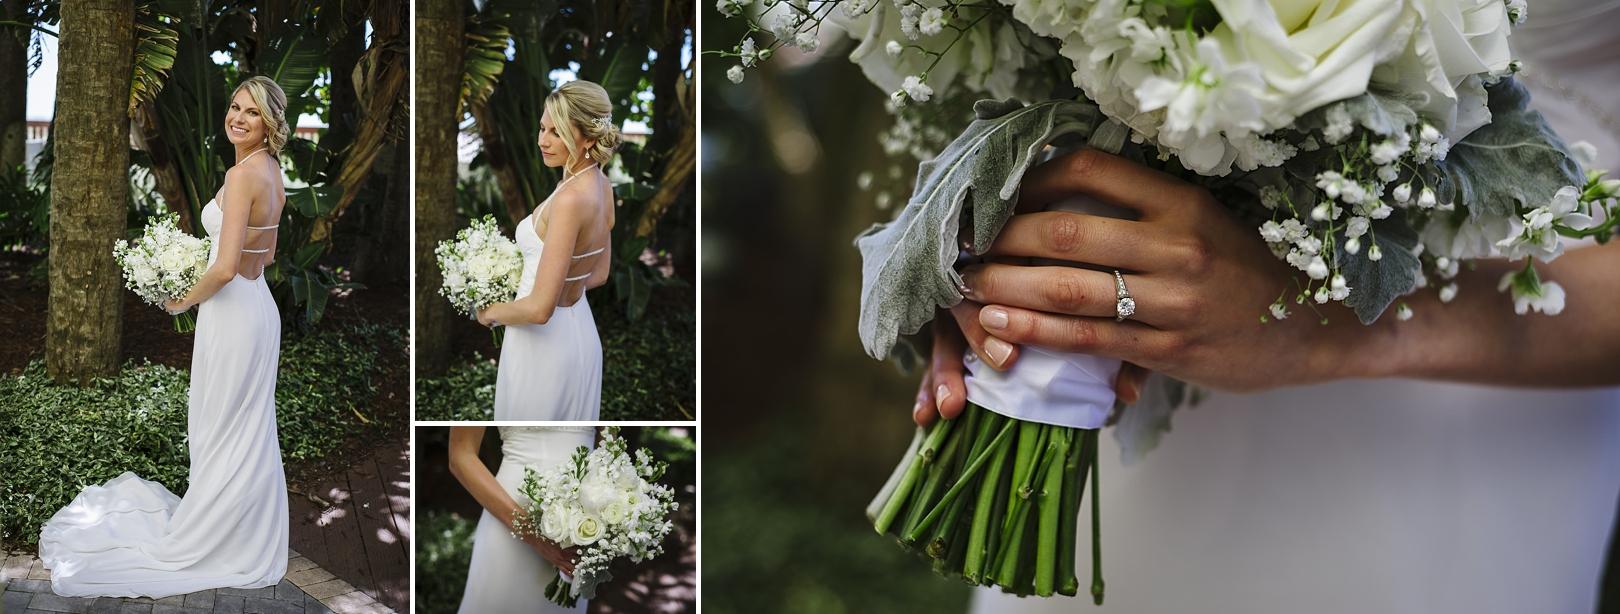 bridal portraits sirata beach wedding photos